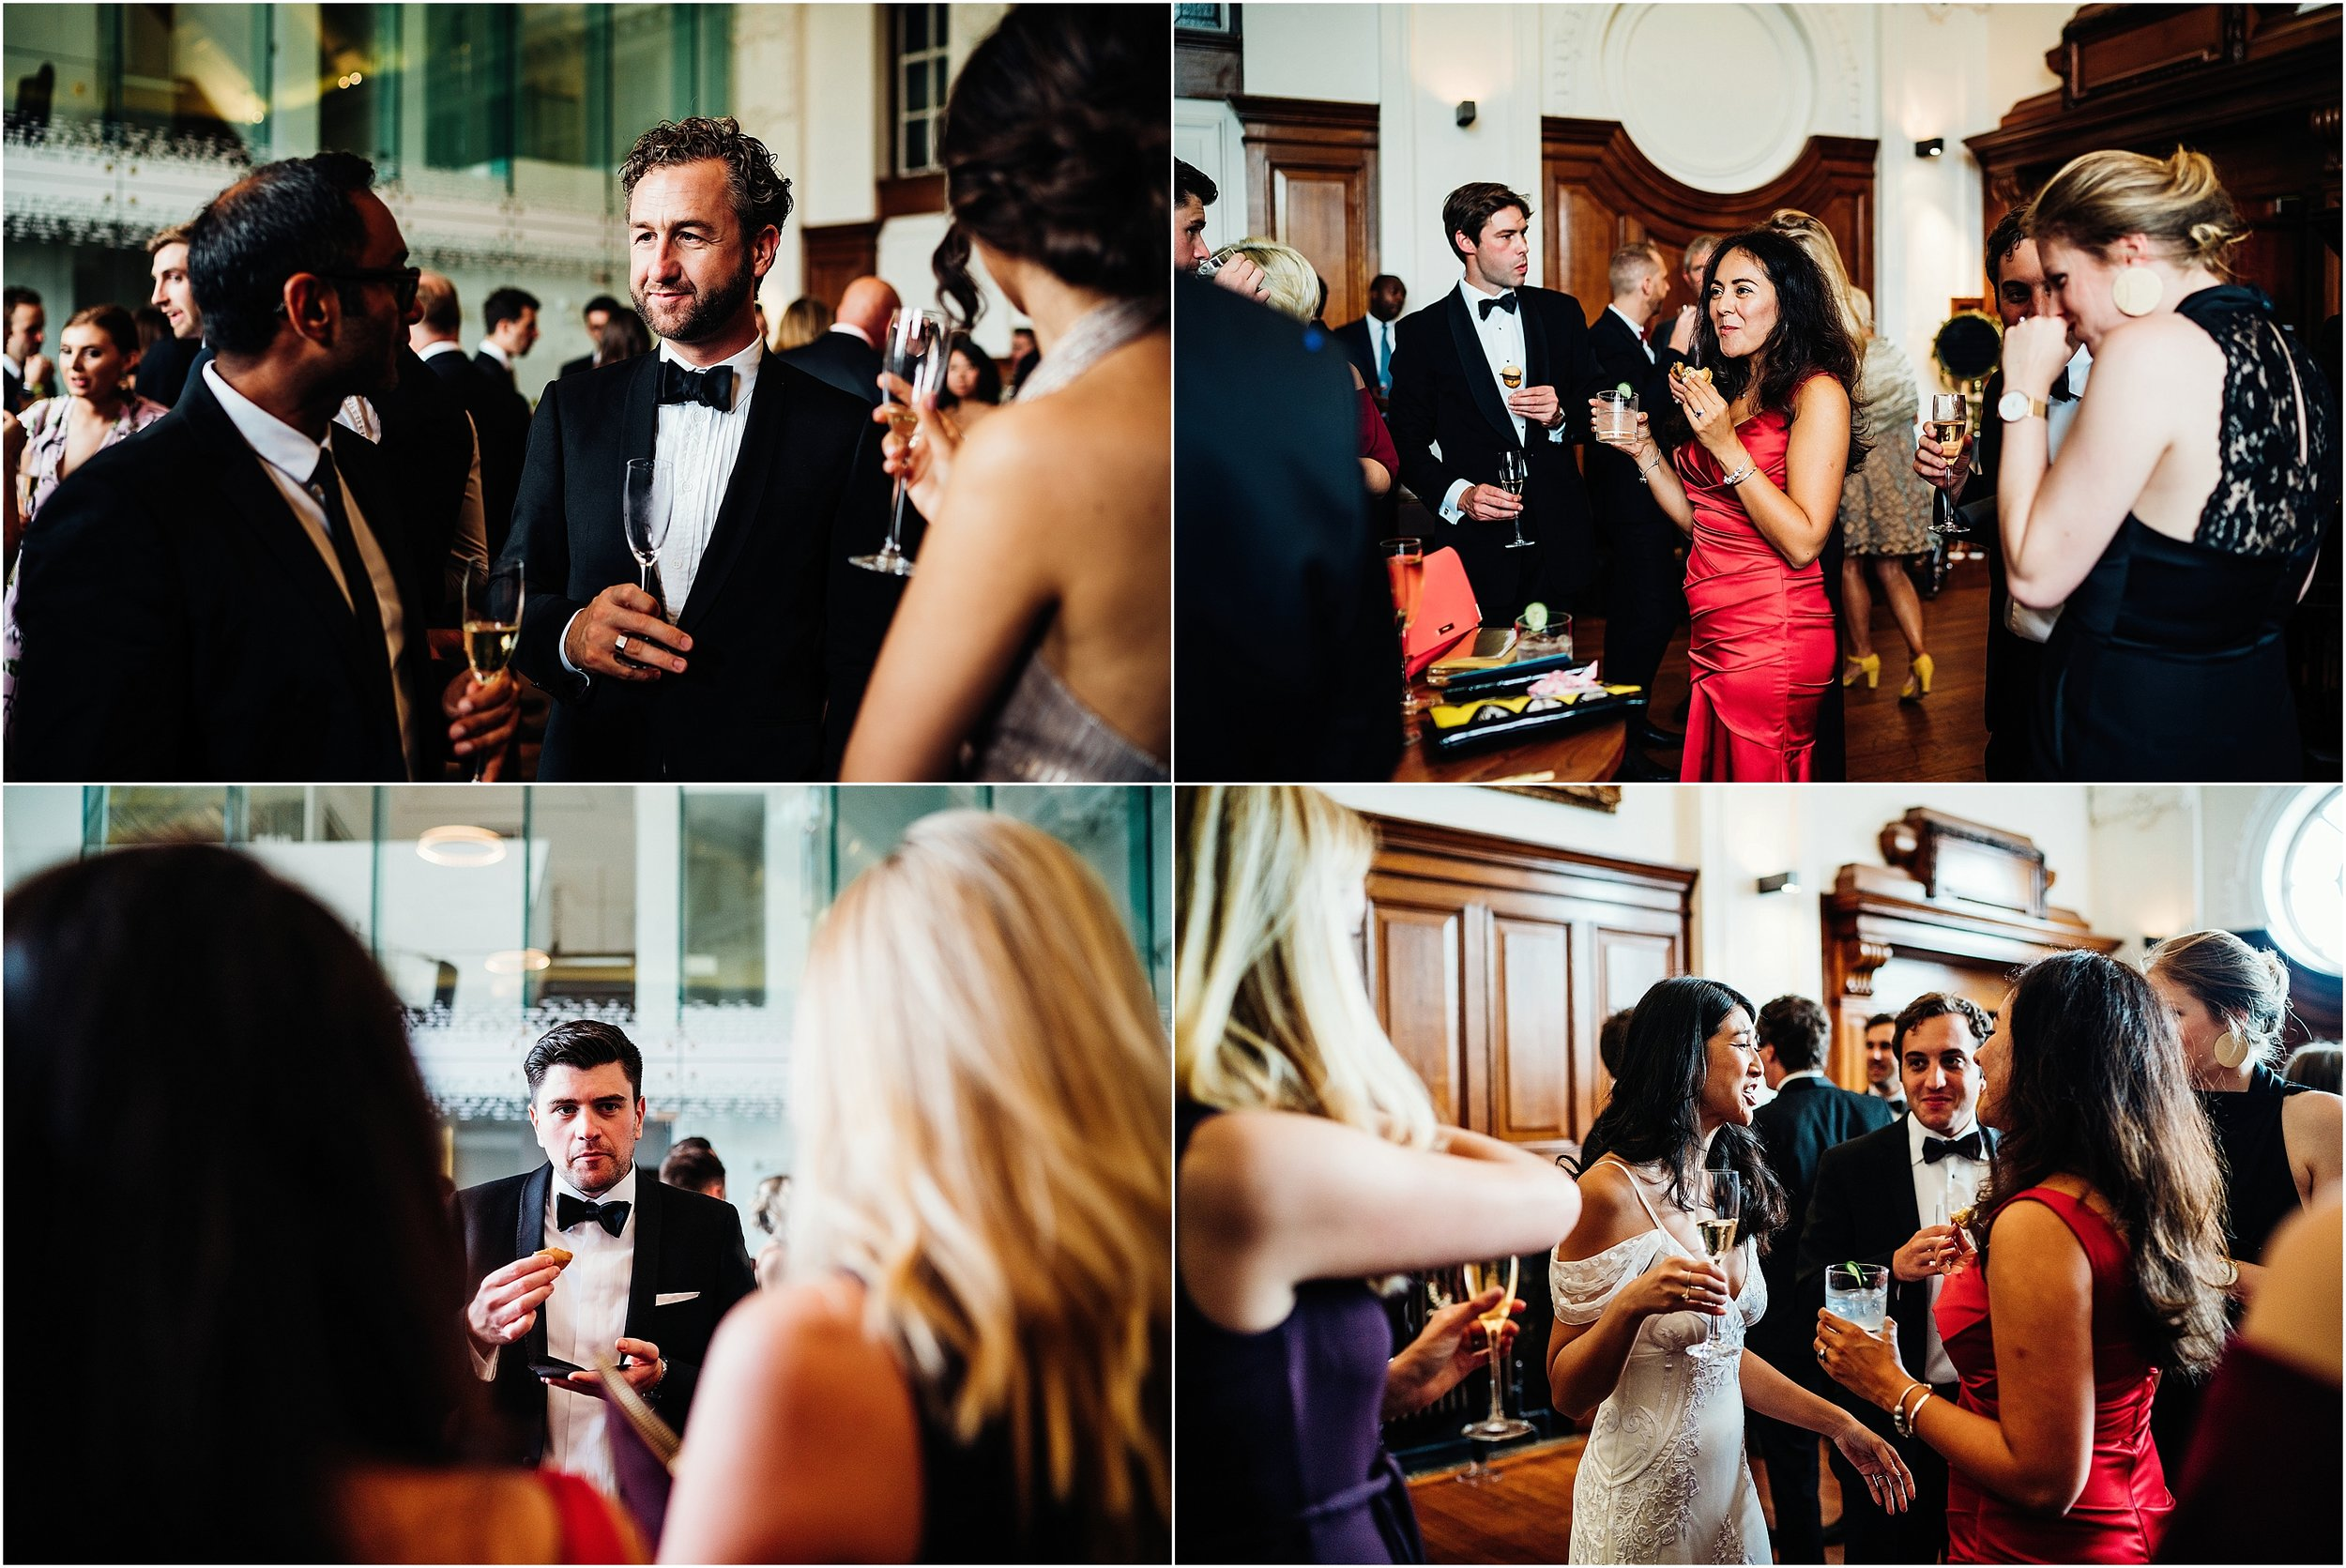 bethnal green town hall hotel wedding_0030.jpg